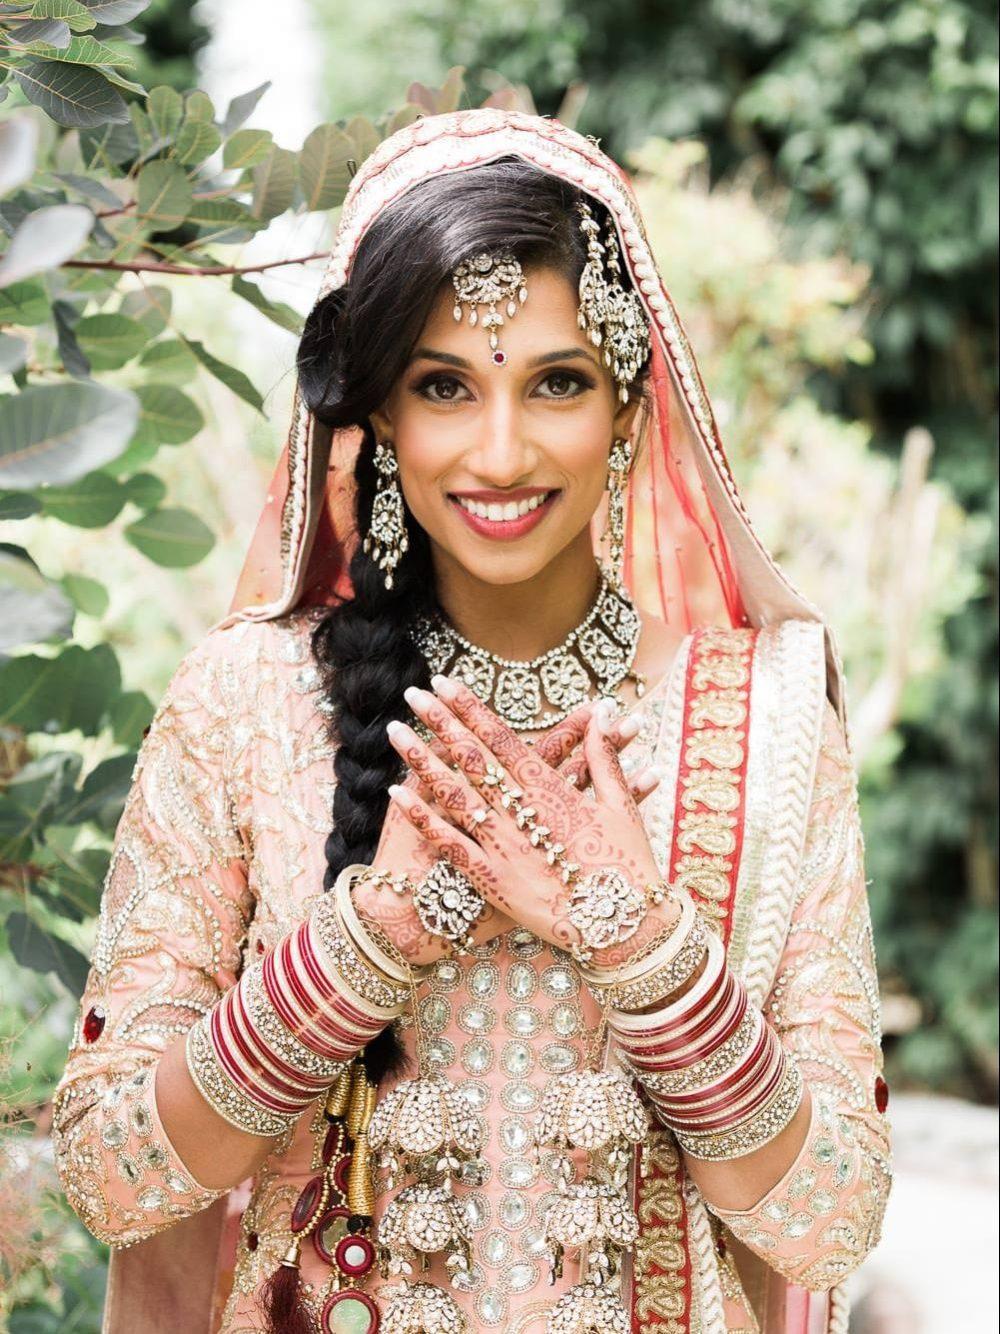 Indian bride portrait | Vancouver Indian wedding photographer